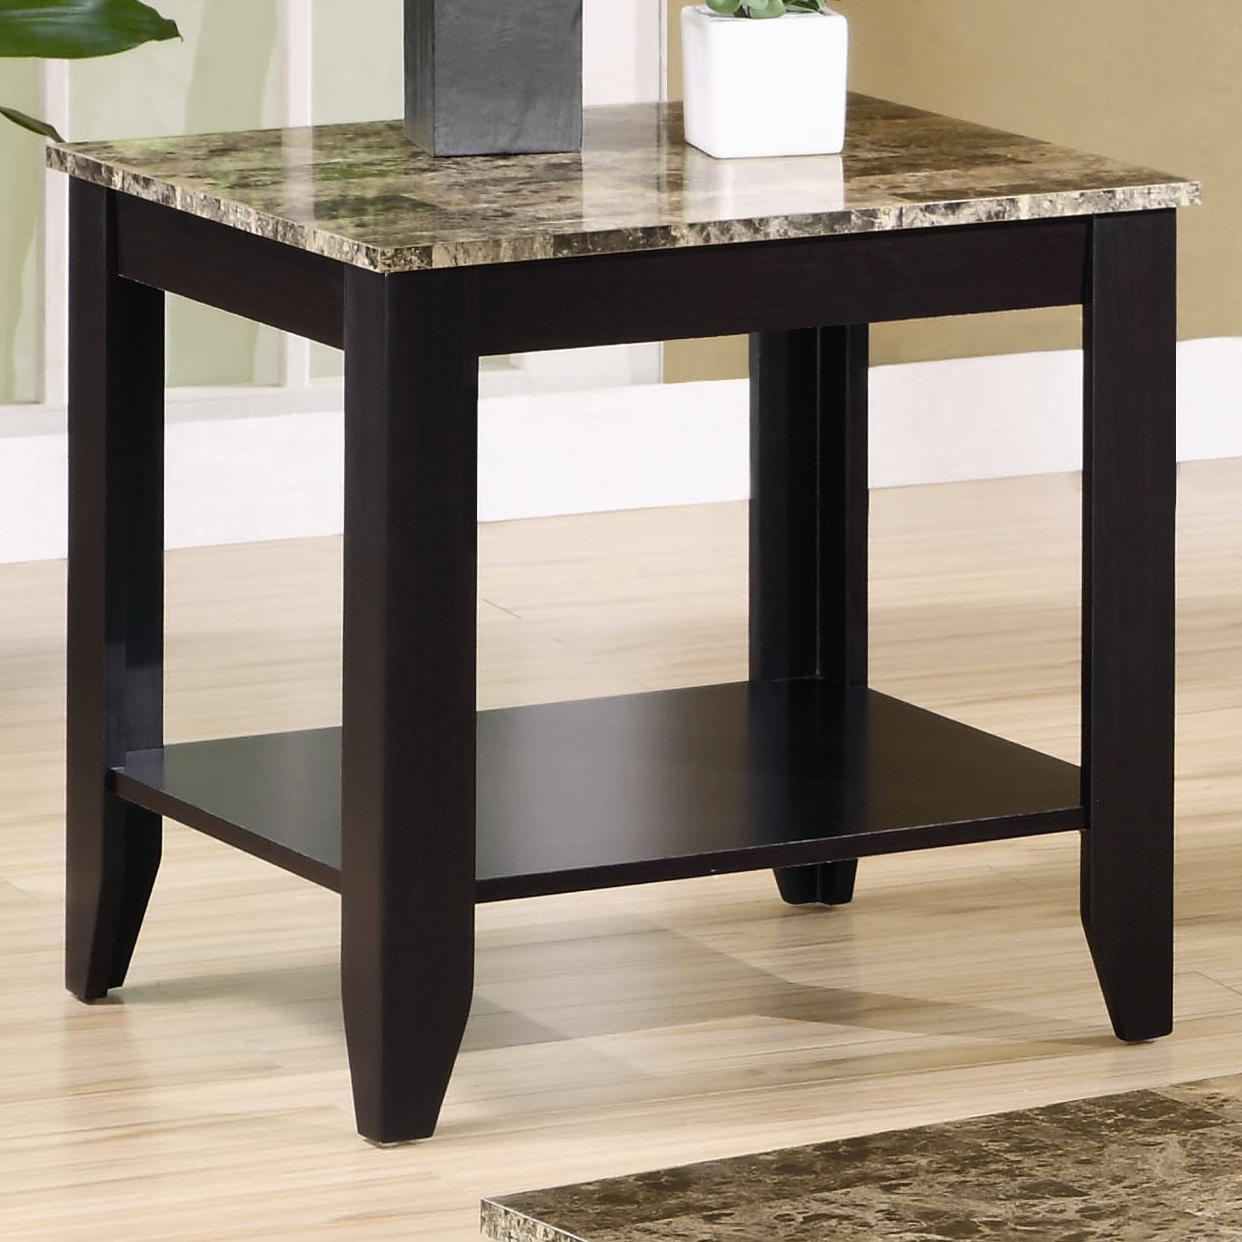 Marble Look Top Coffee Table: Coaster Occasional Table Sets 3 Piece Occasional Table Set